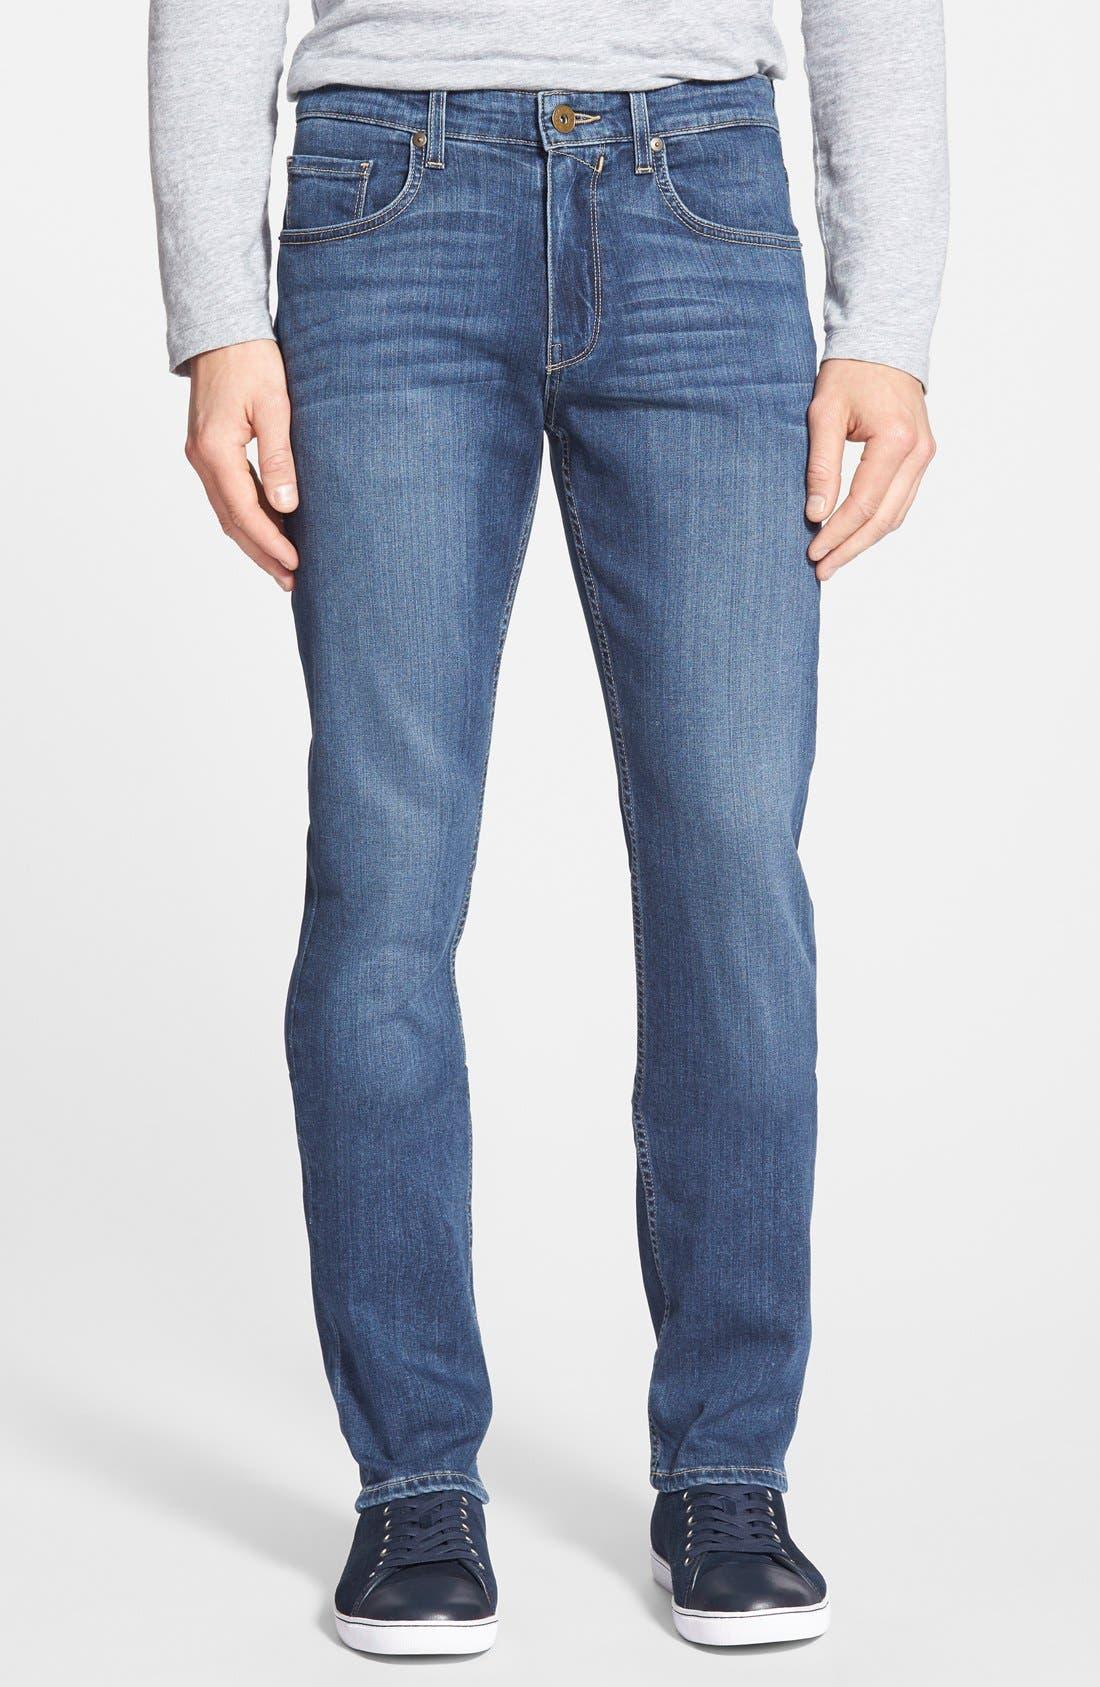 PAIGE, Transcend - Federal Slim Straight Leg Jeans, Main thumbnail 1, color, BIRCH